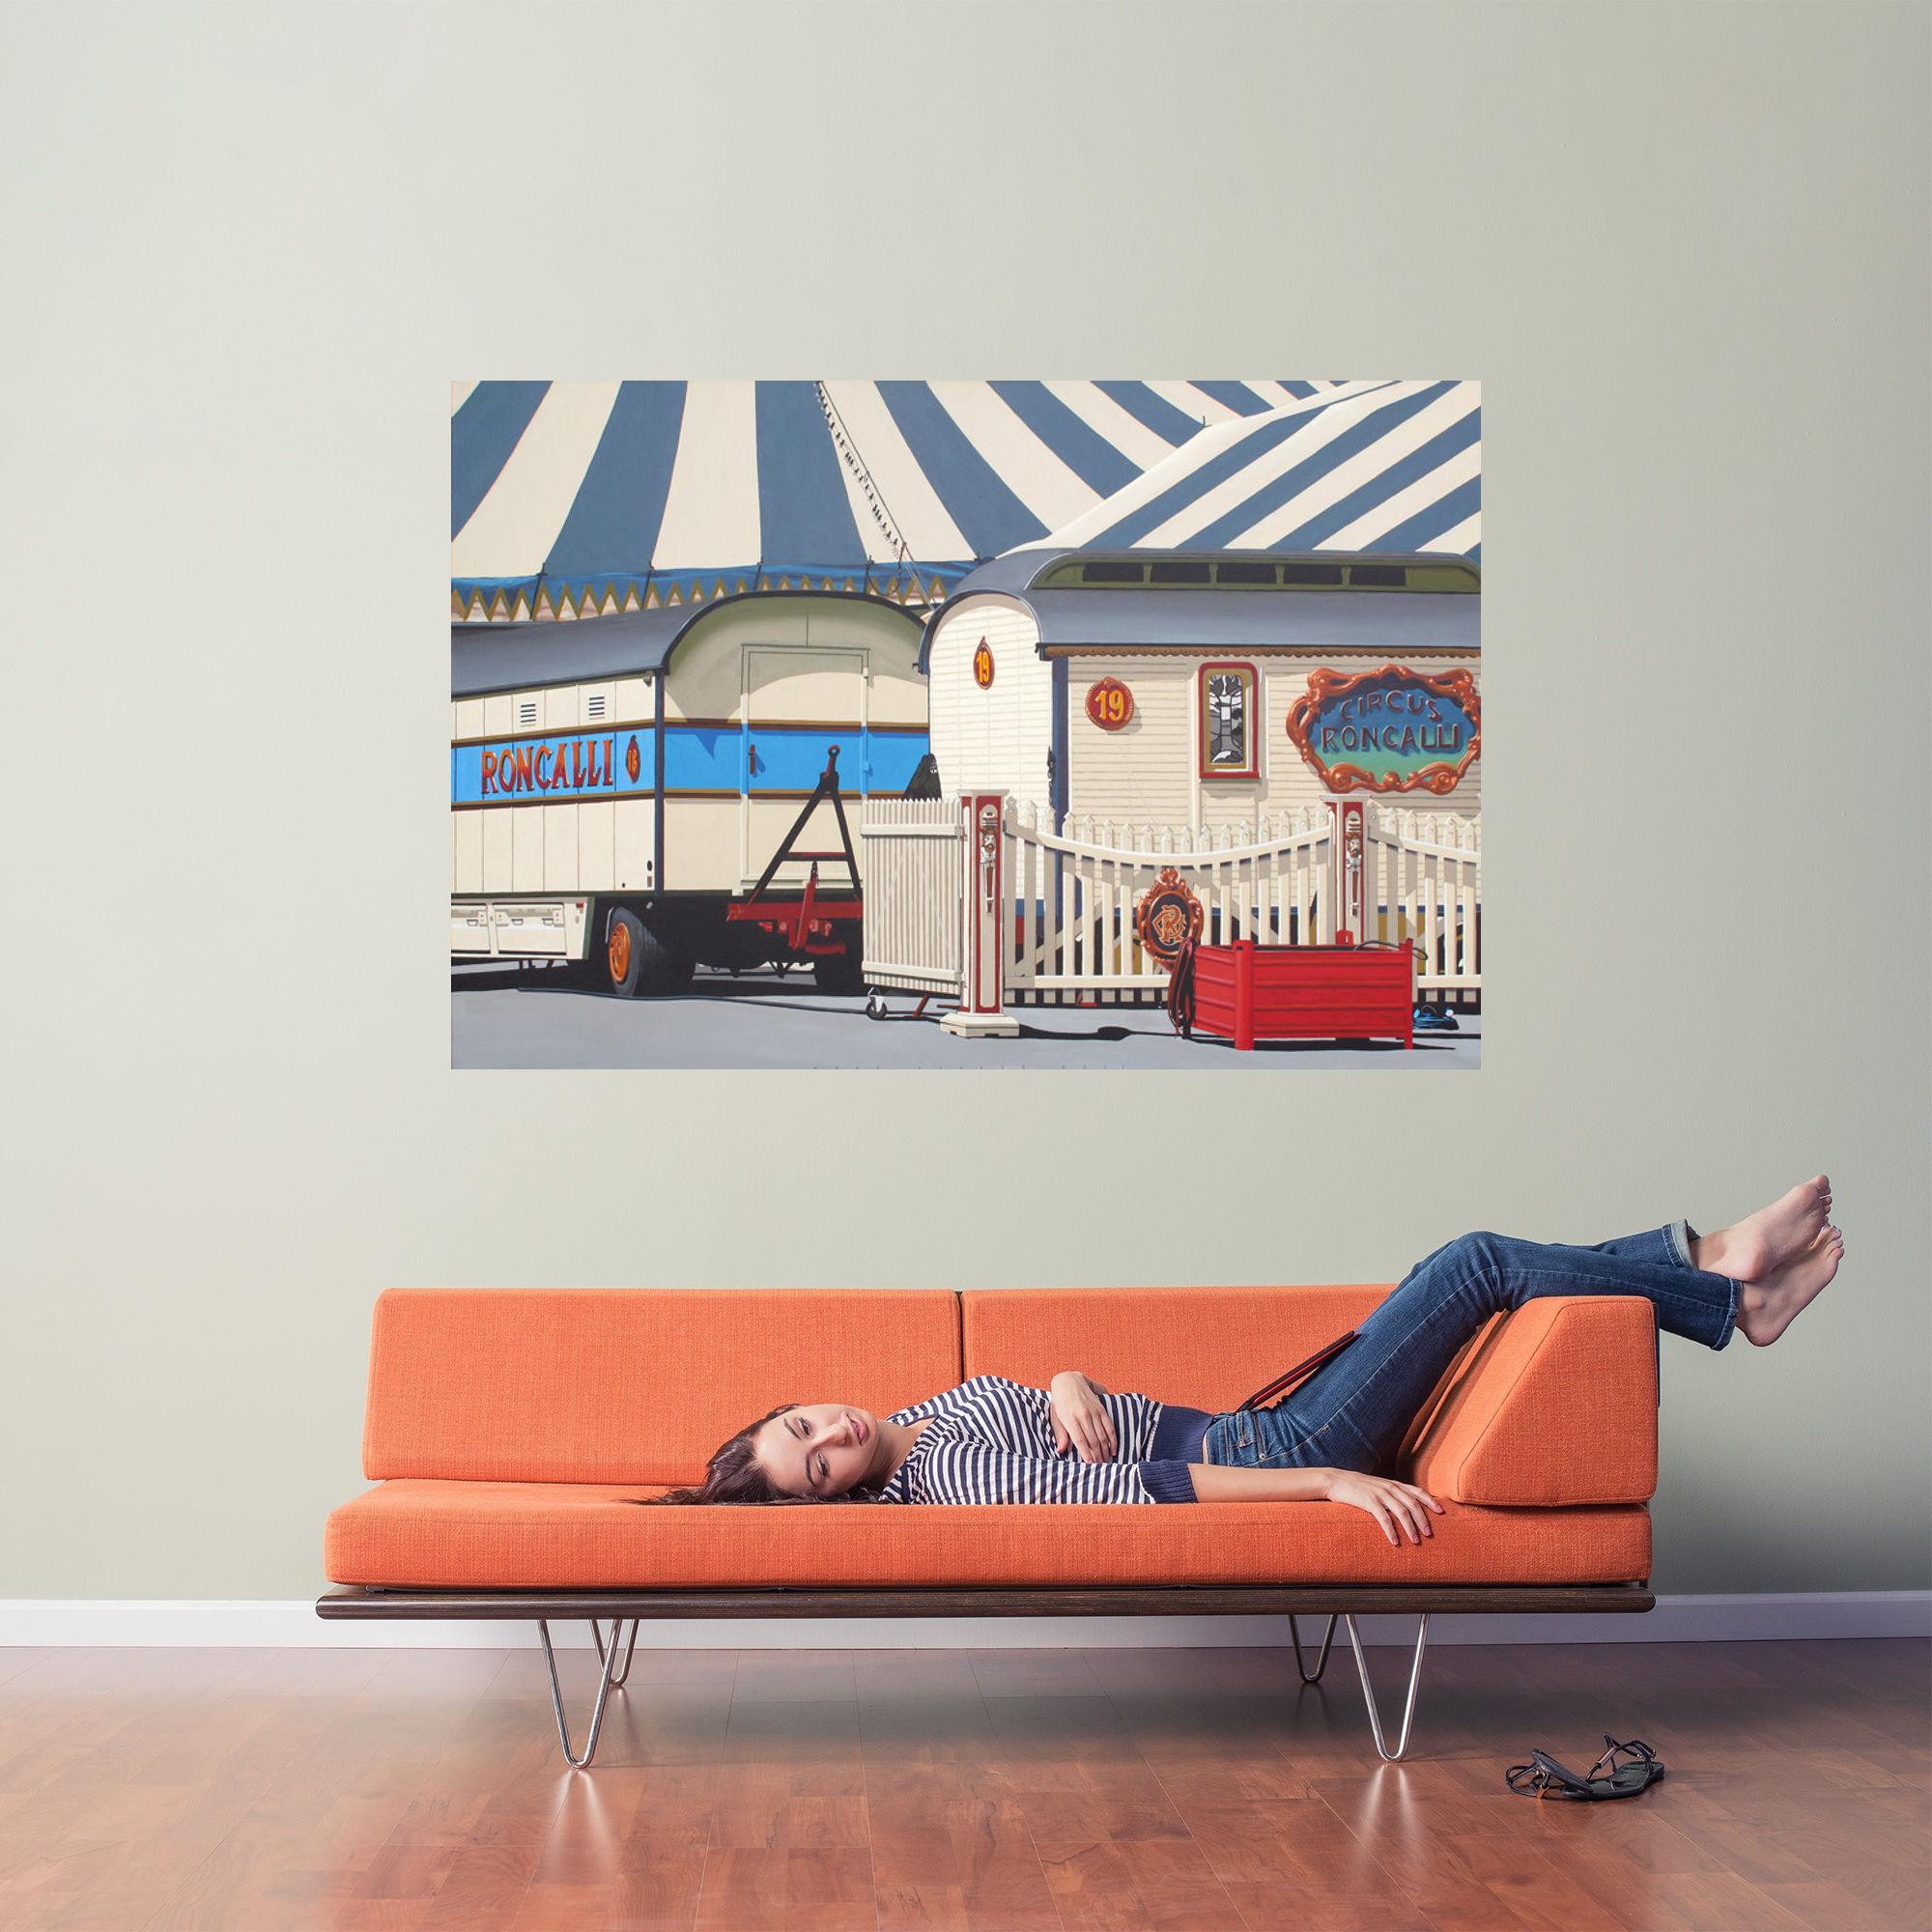 Circus 2 (twee wagens)